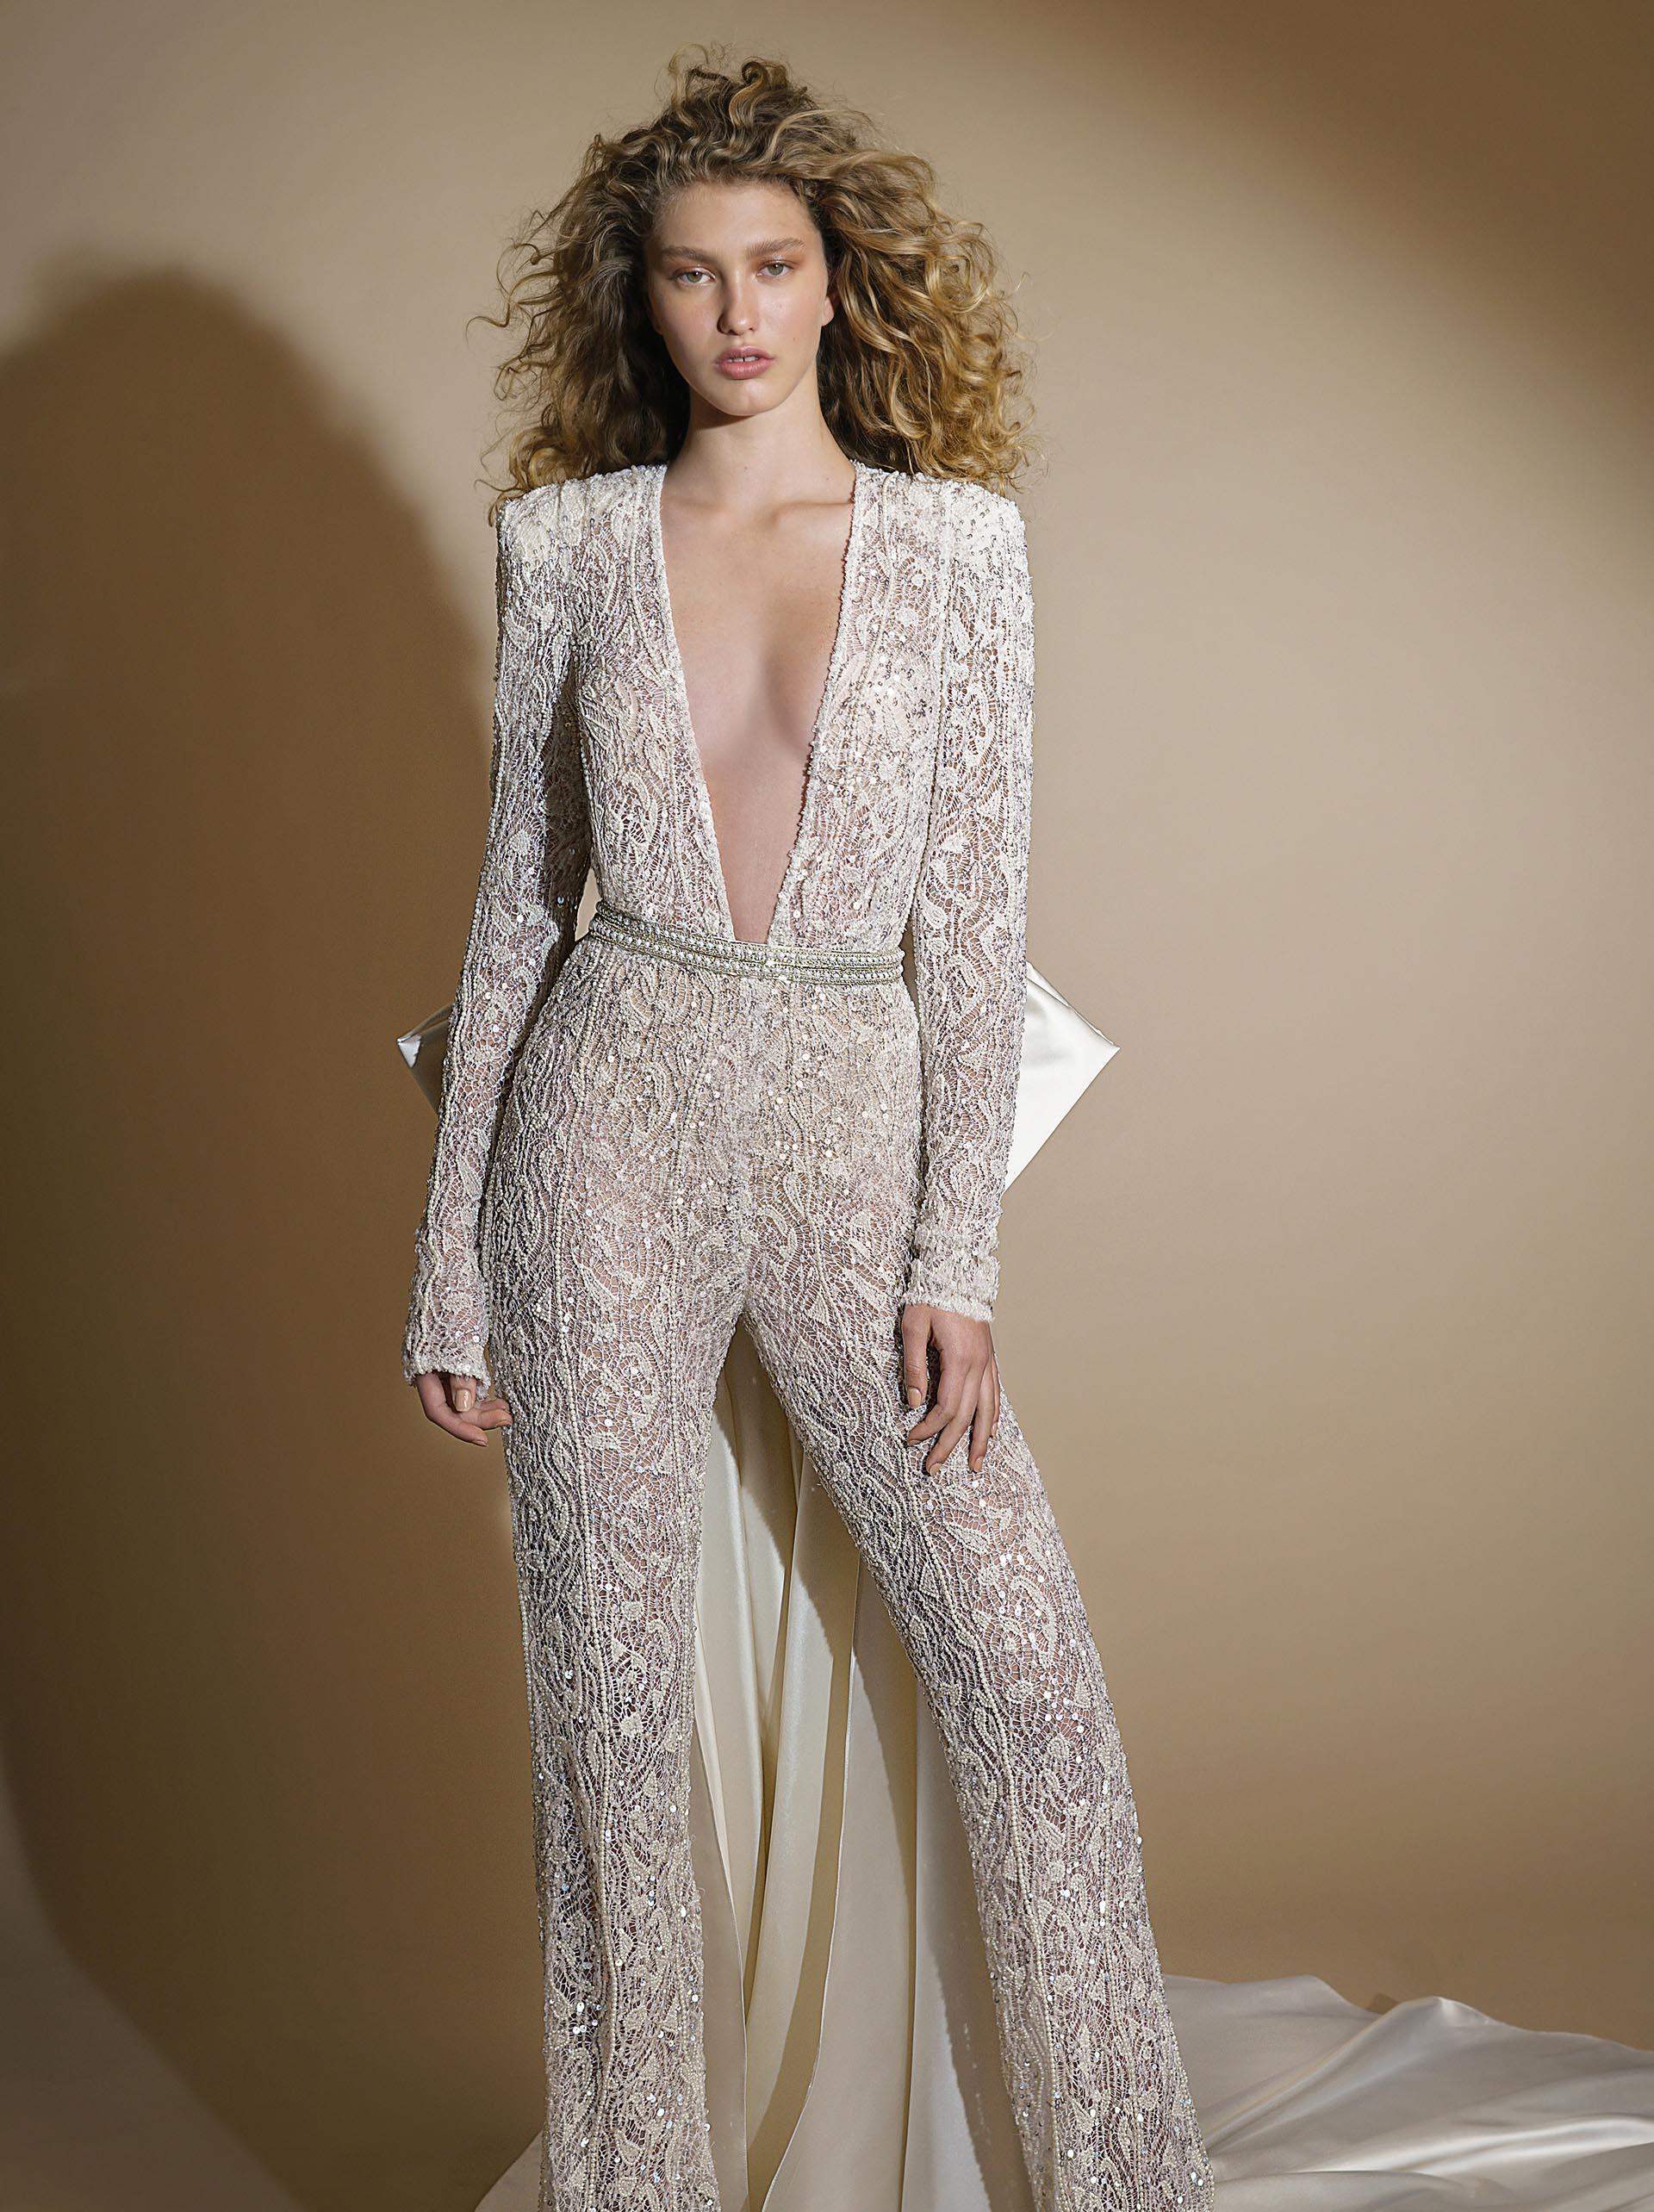 GALA G - 109 white beaded long sleeve wedding jumpsuit Tampa bridal boutique